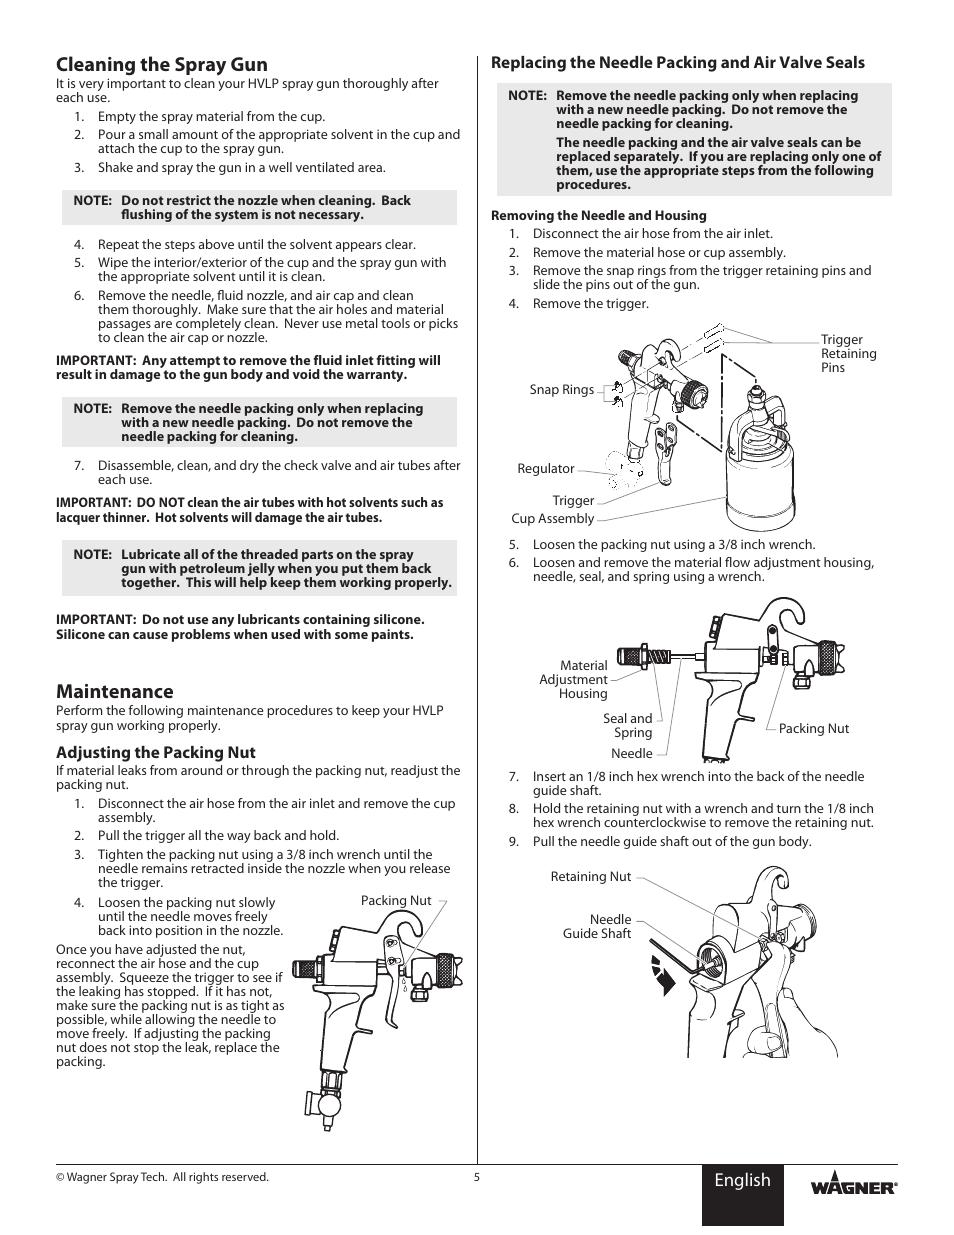 Cleaning The Spray Gun Maintenance English Wagner Hvlp Conversion Gun User Manual Page 5 28 Original Mode